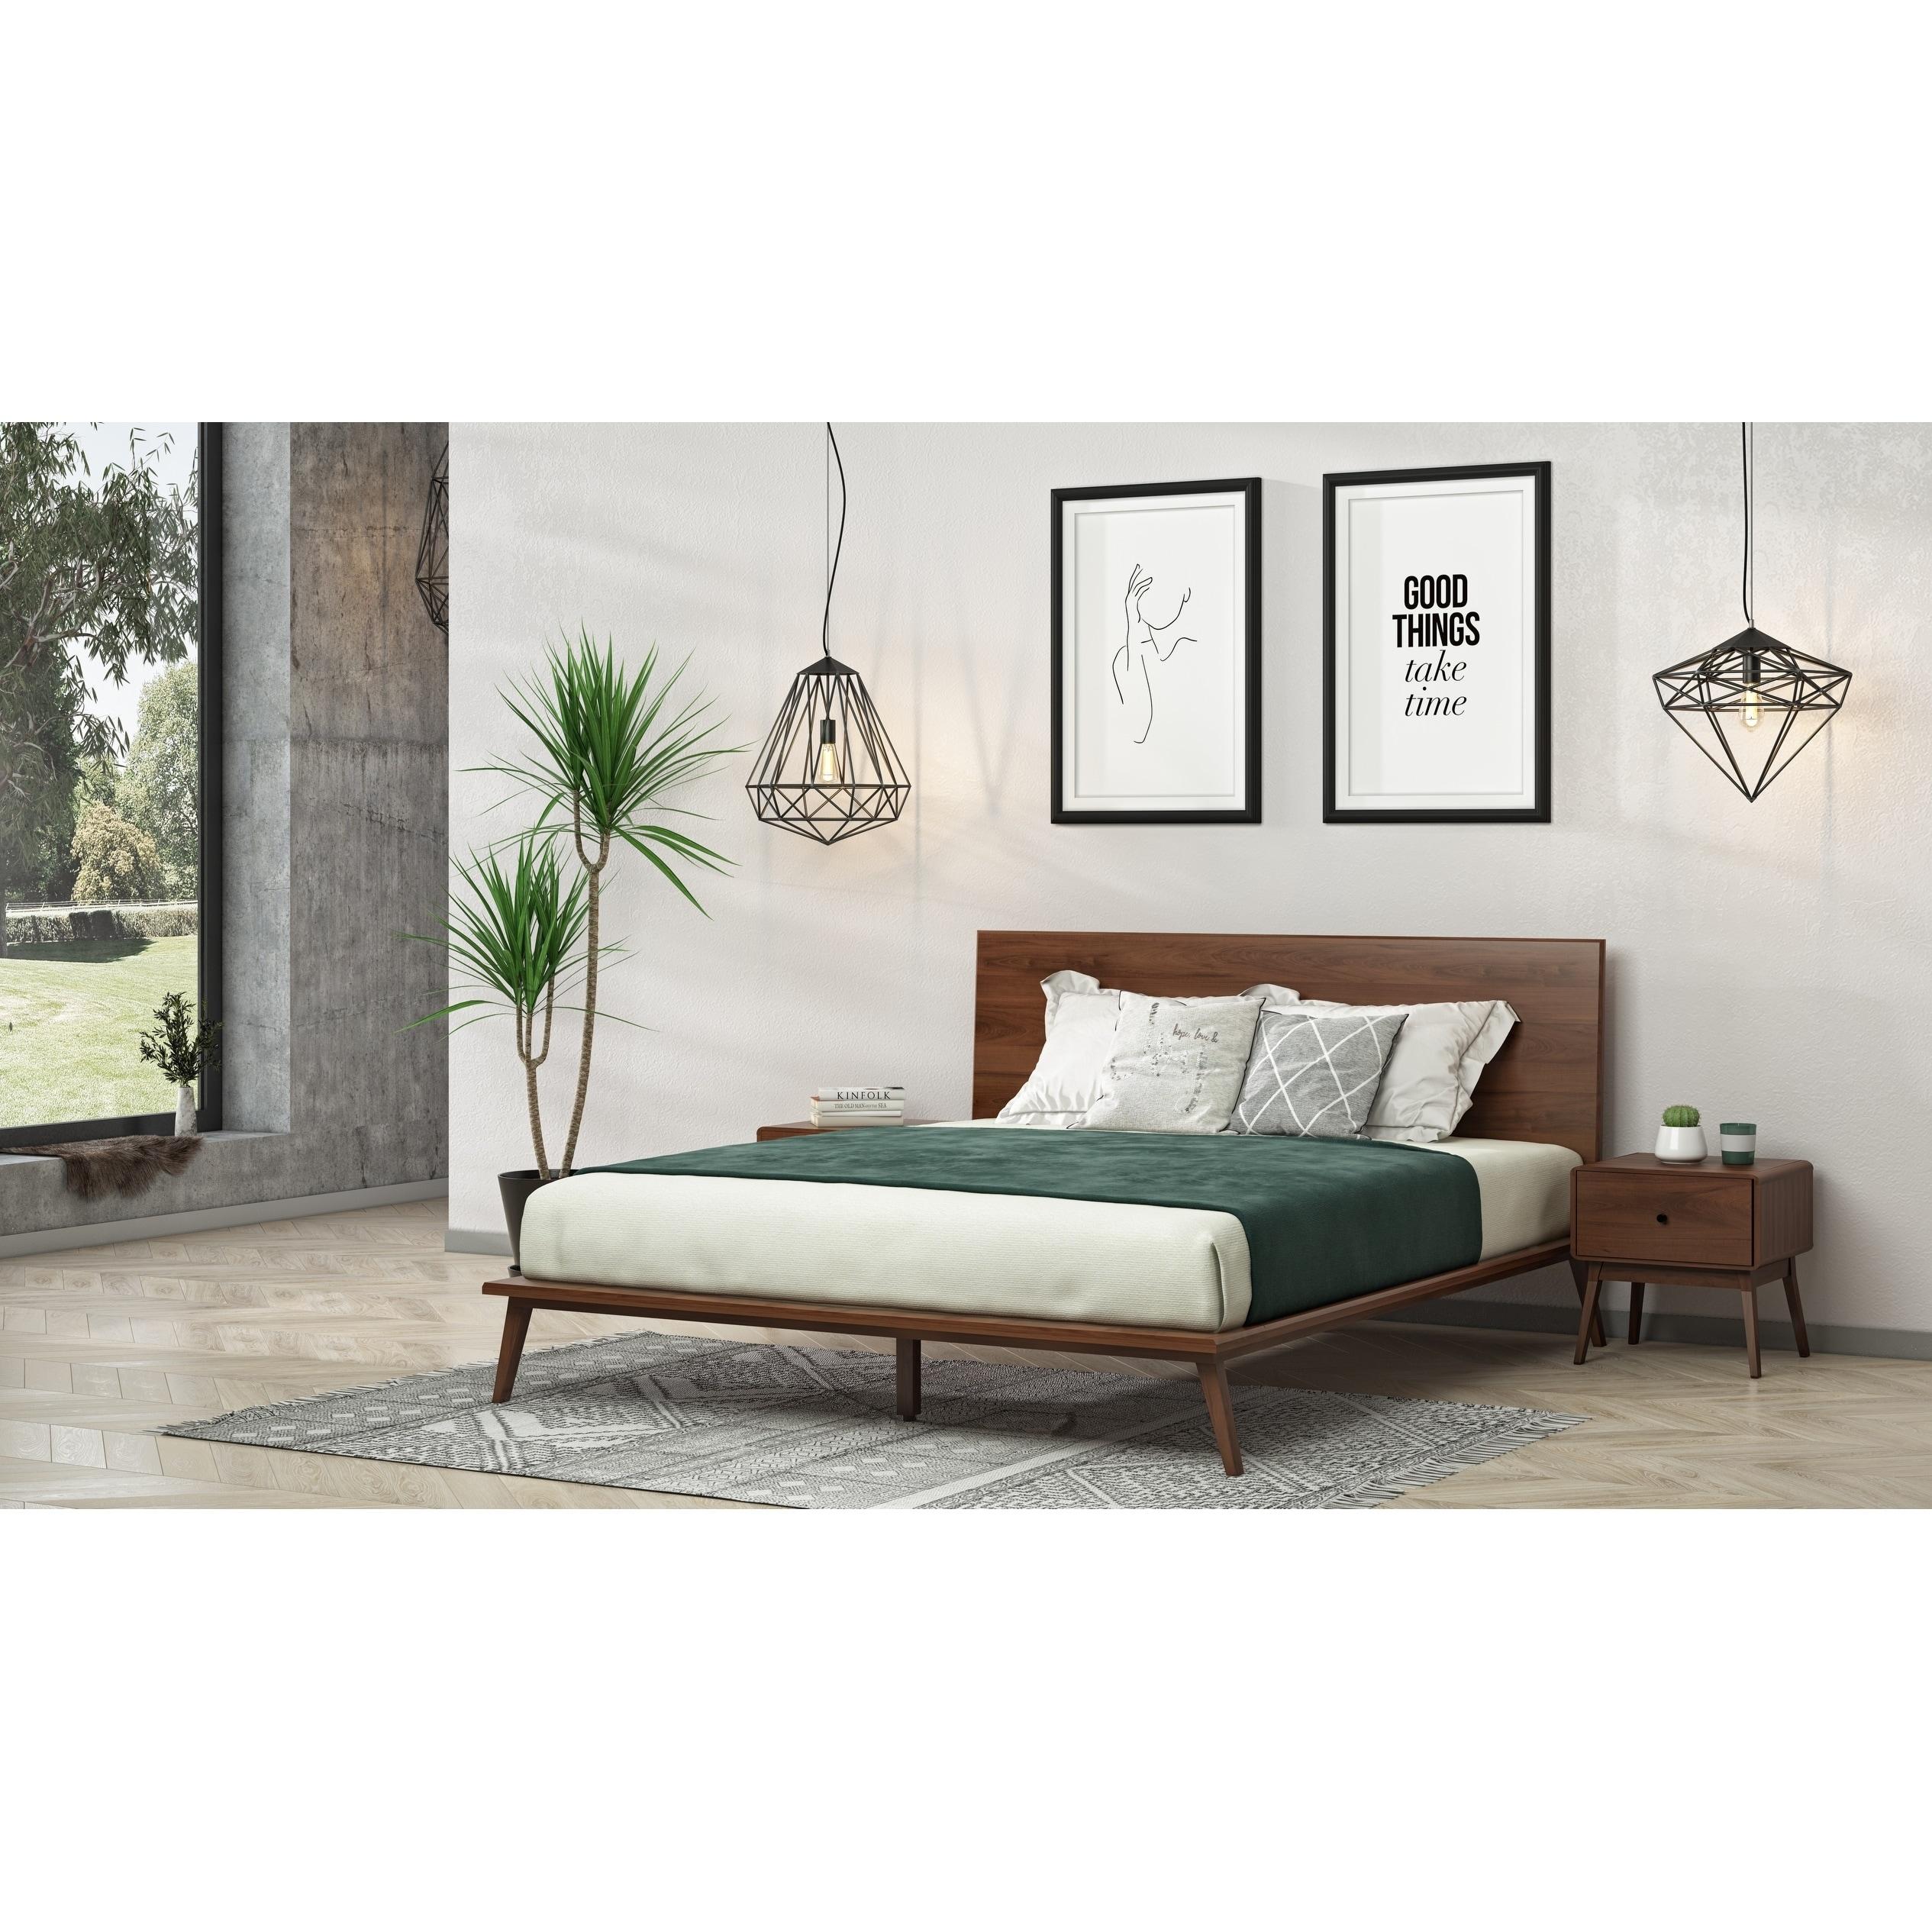 Shop Modrest Carmen Mid Century Modern Walnut Bed Overstock 26981552 Queen,Best Shutter Colors For Brick House